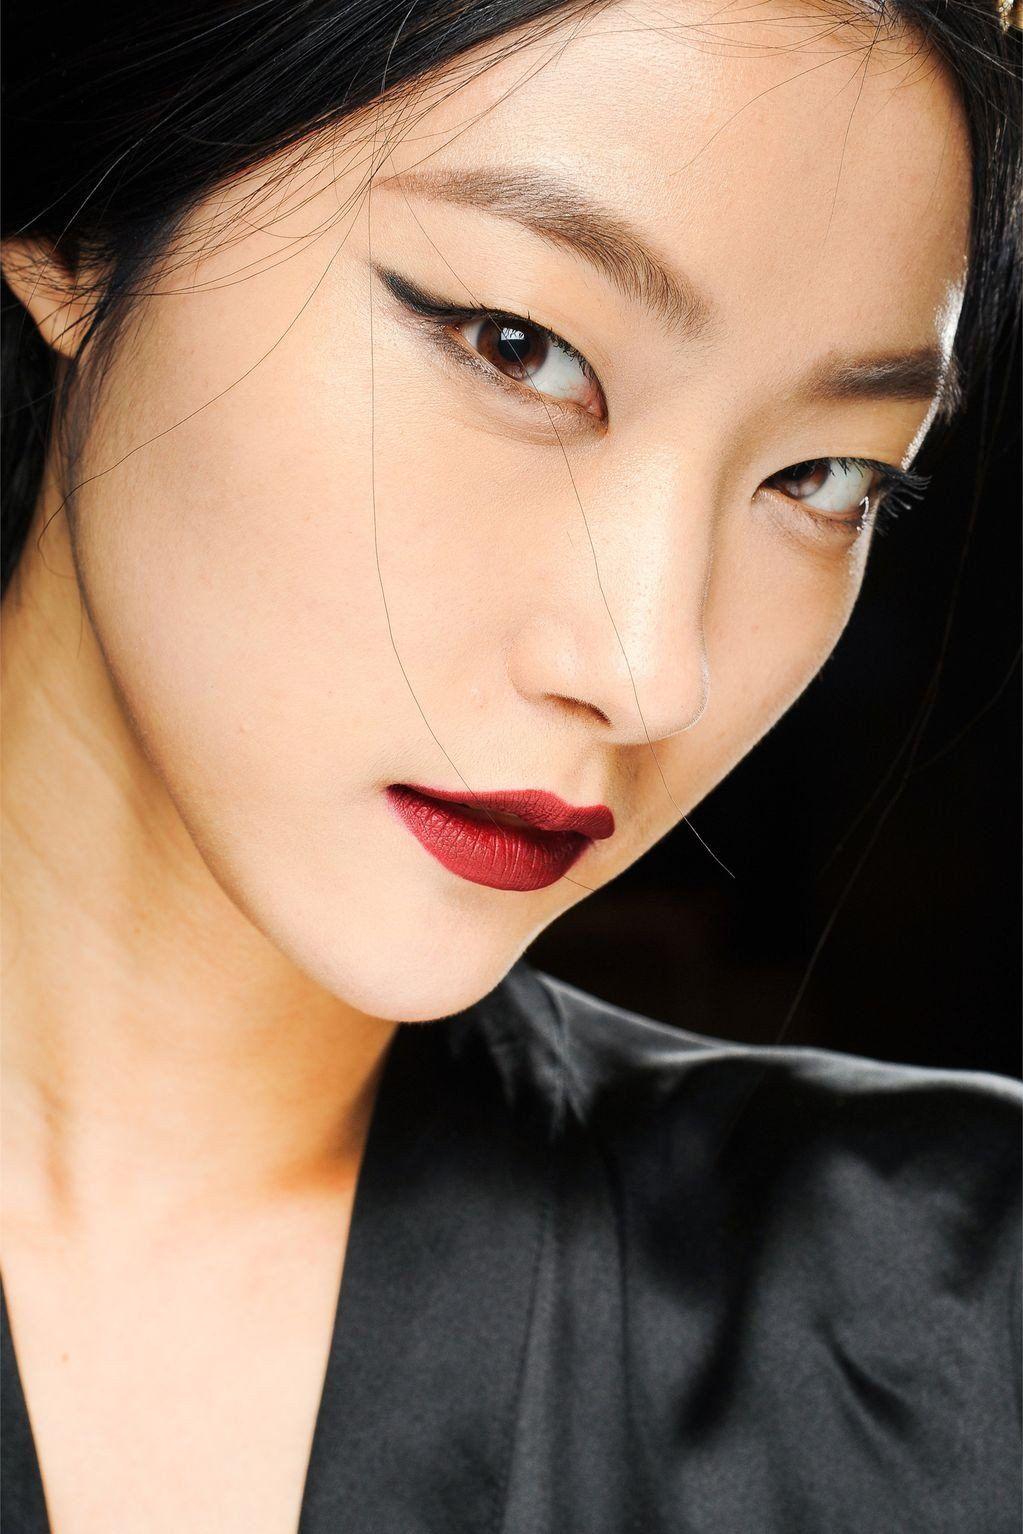 16 of the fiercest, baddest high fashion models Asian